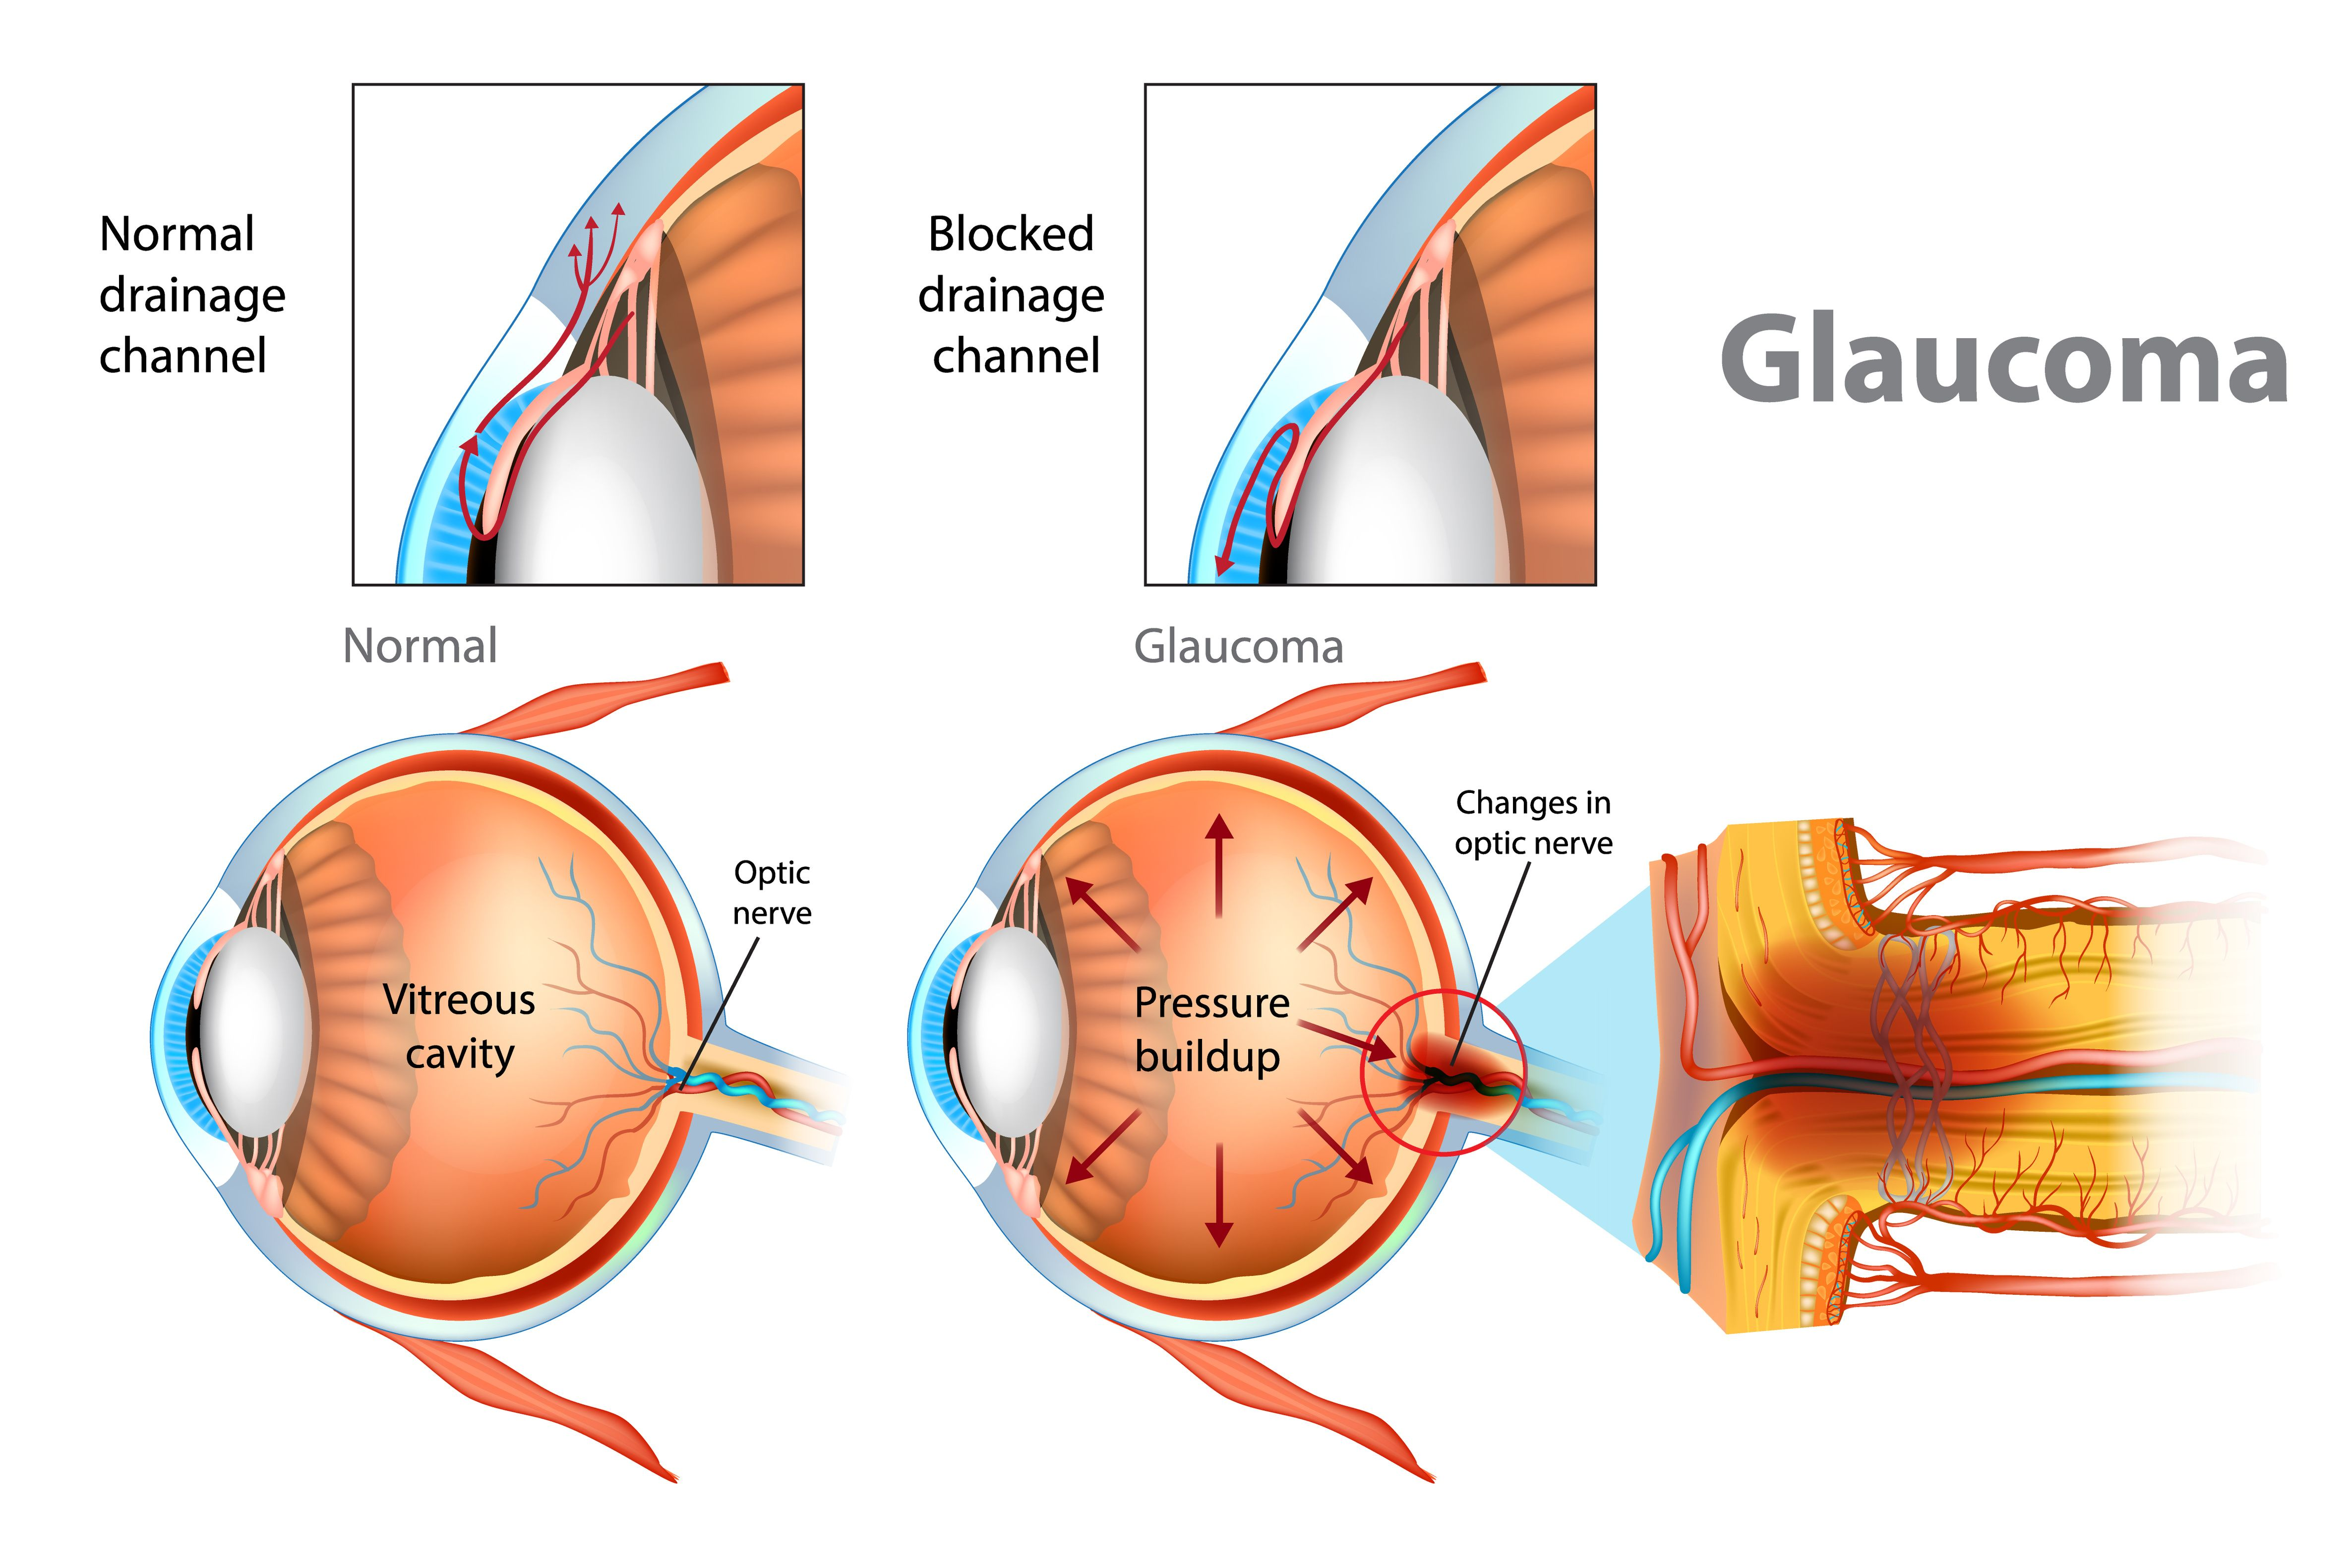 5 glaucoma management myths